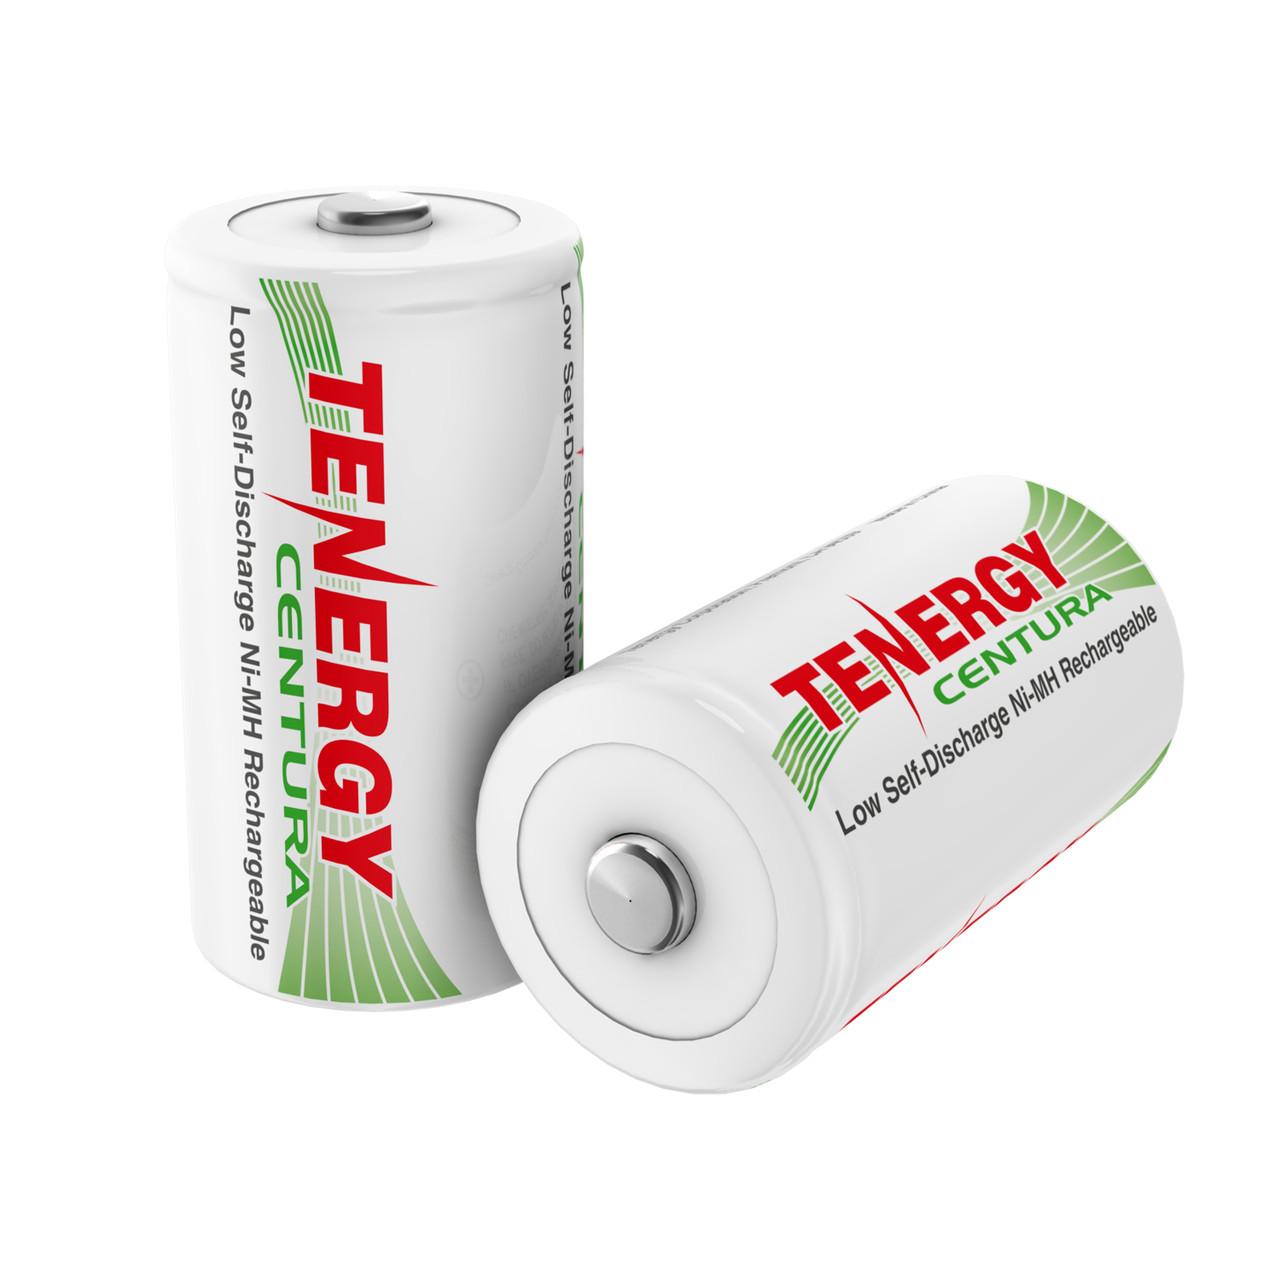 2-pack (Card) Tenergy Centura NiMH D 1.2V 8000mAh Rechargeable Batteries